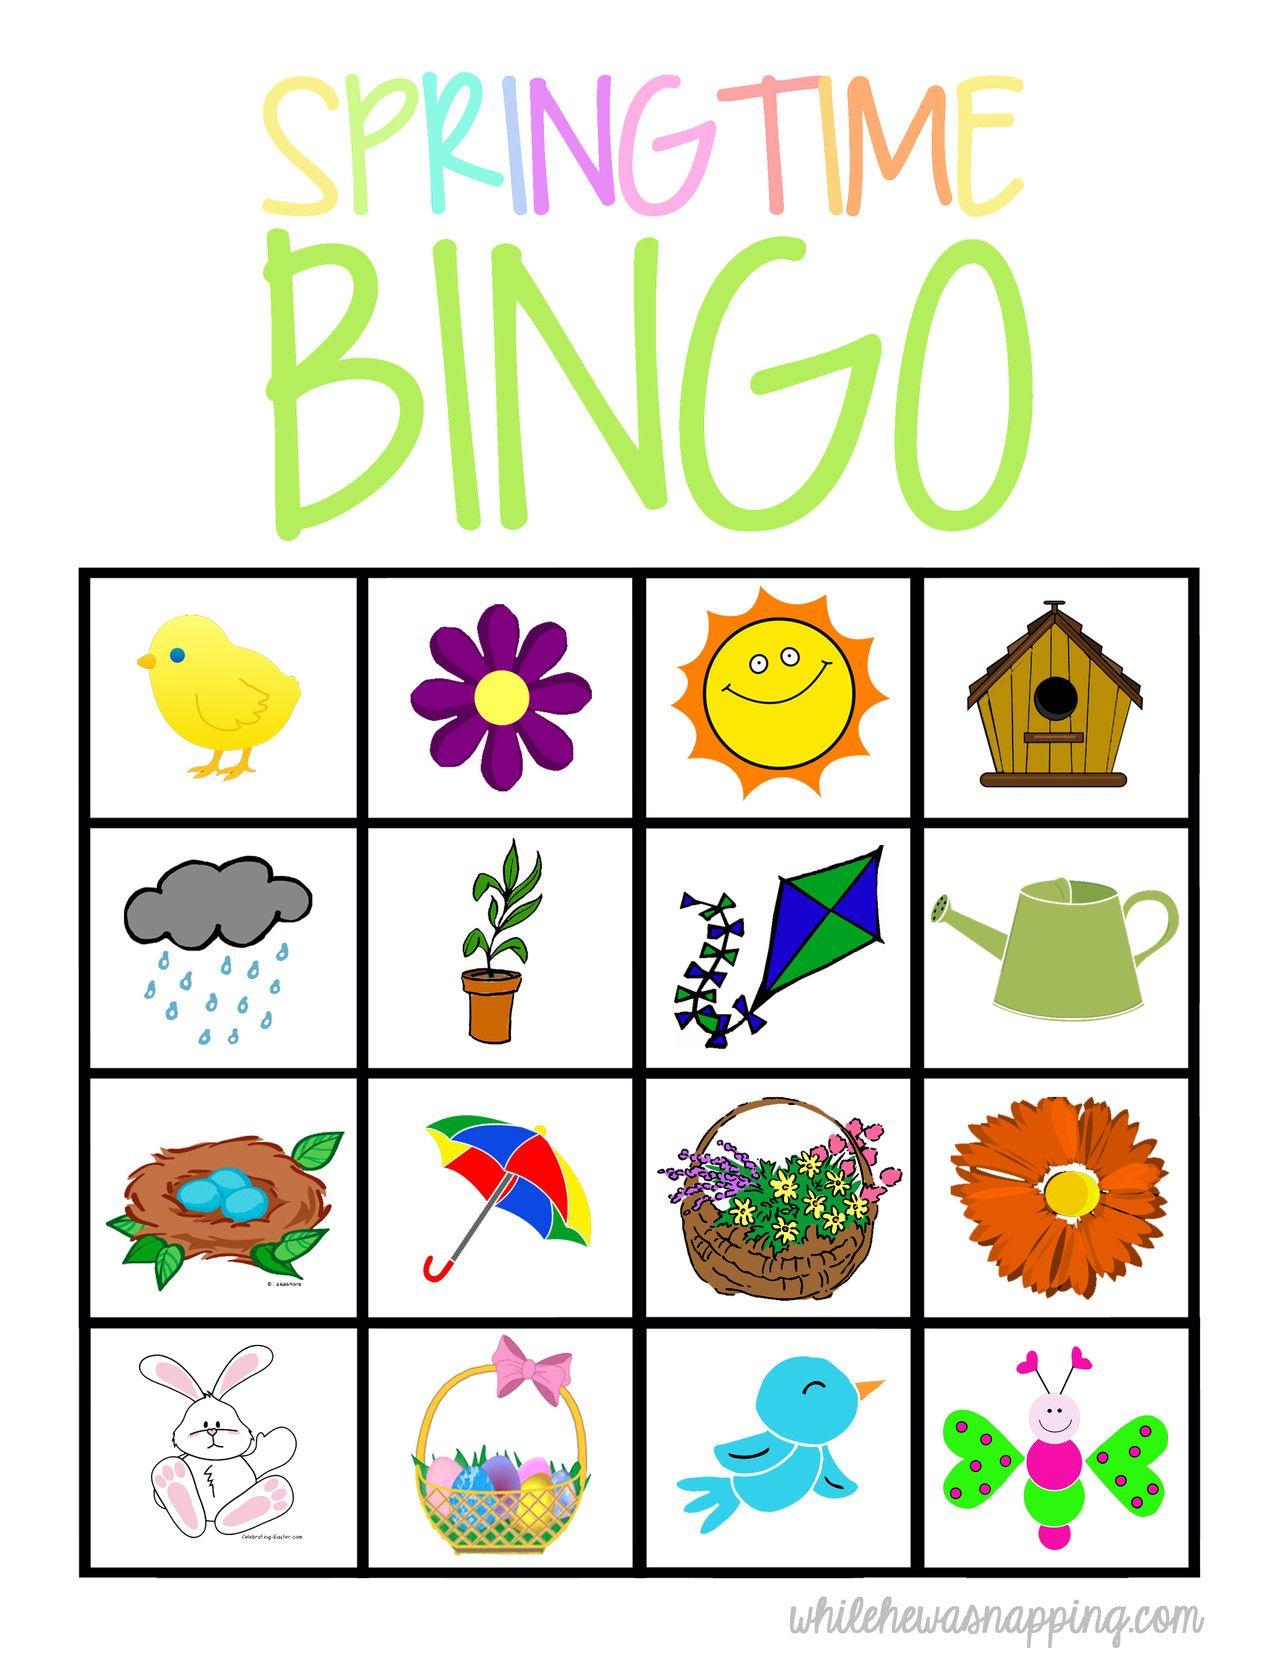 Springtime Bingo Game Printable Games for kids classroom